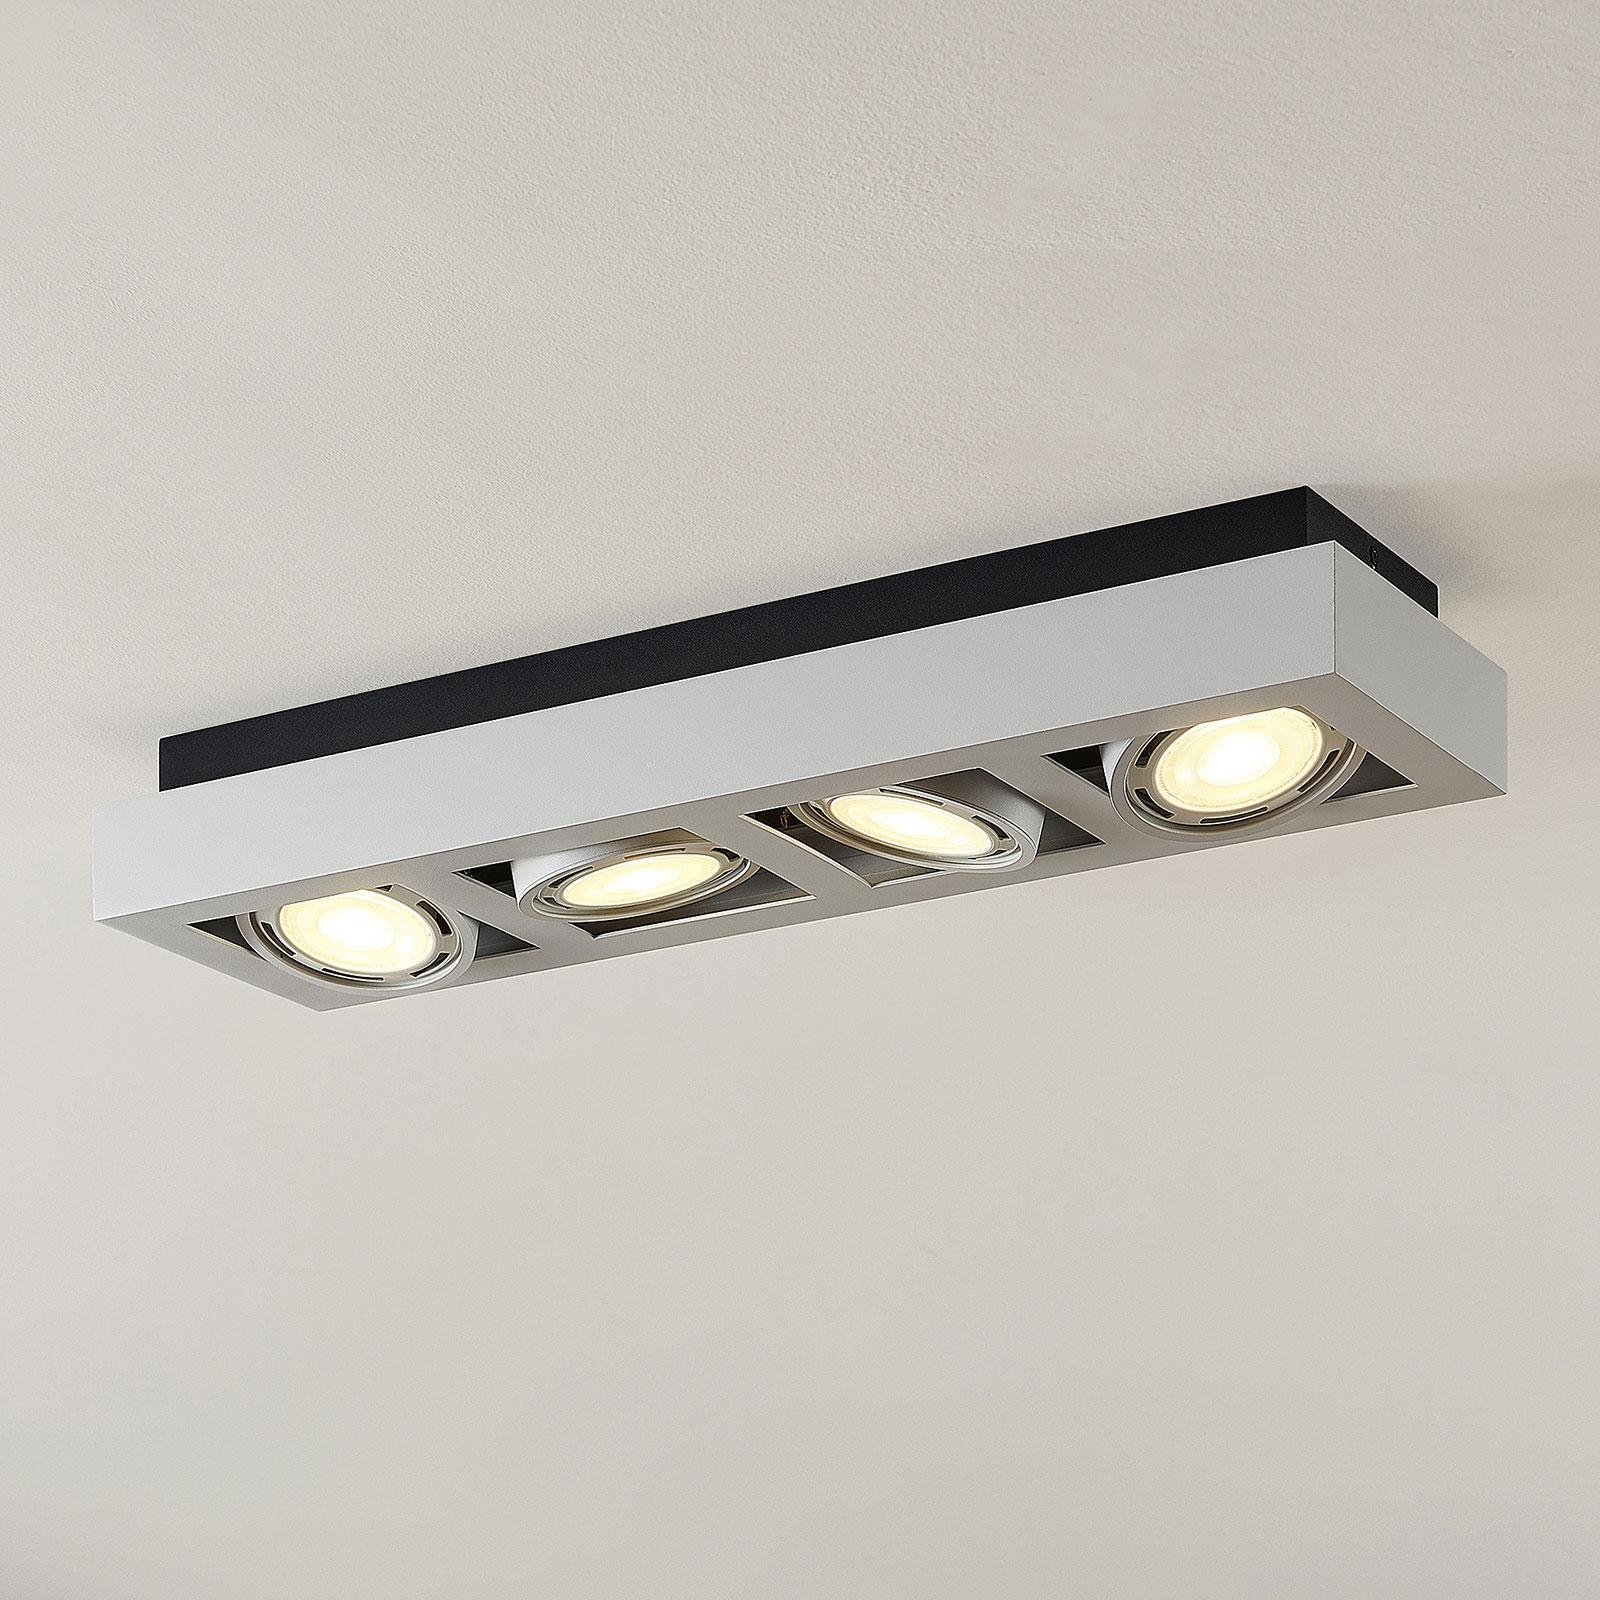 Plafoniera LED Ronka lunga, 4 luci, bianca